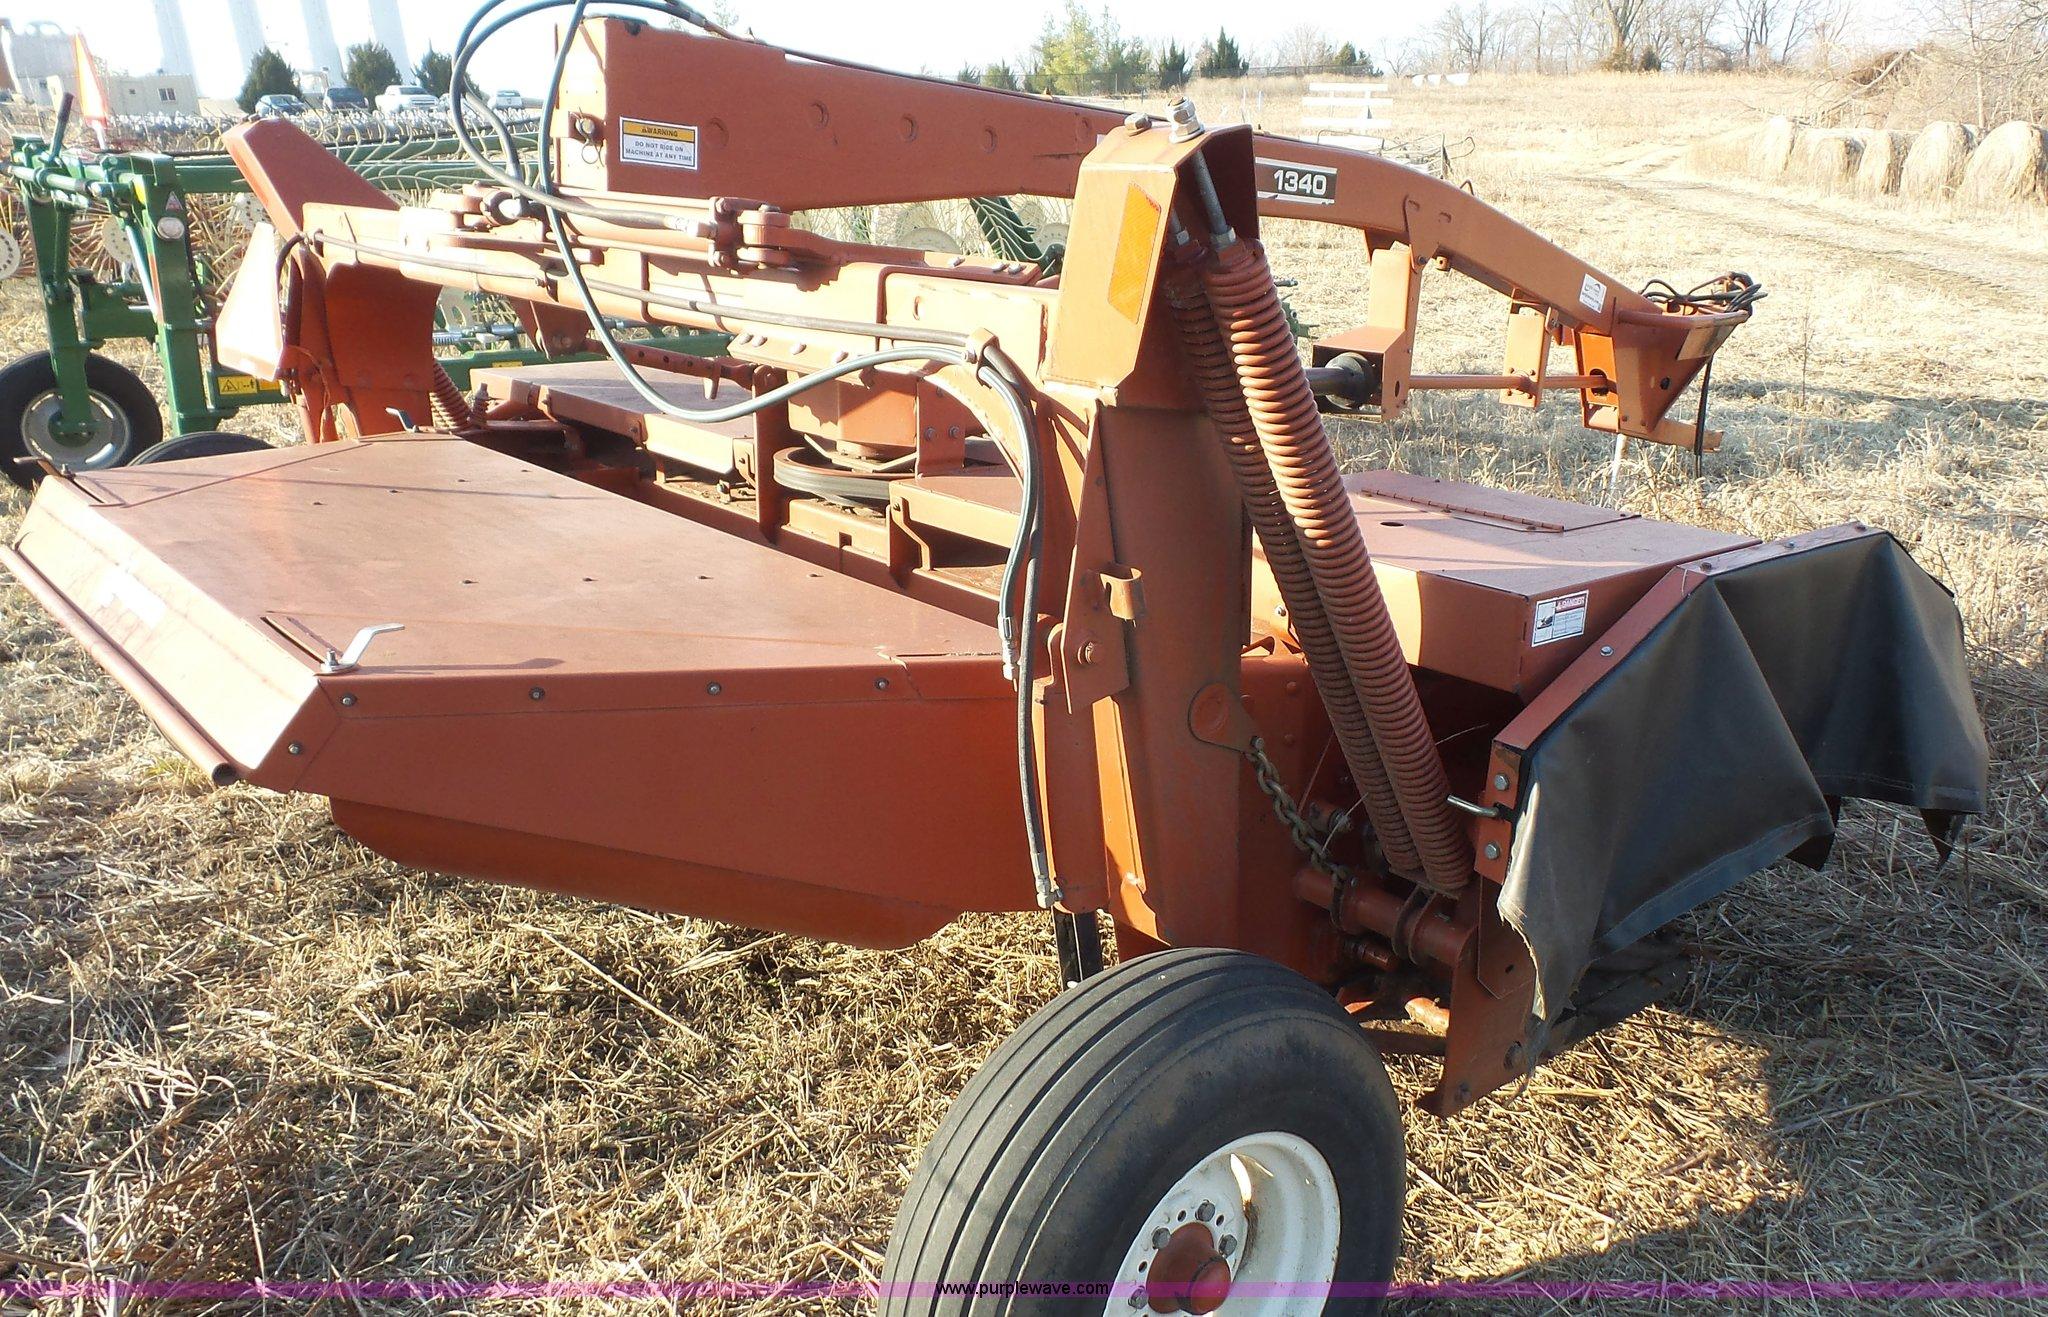 hesston 1340 windrower item j4683 sold march 16 ag equi rh purplewave com hesston 1340 service manual hesston 1340 operators manual